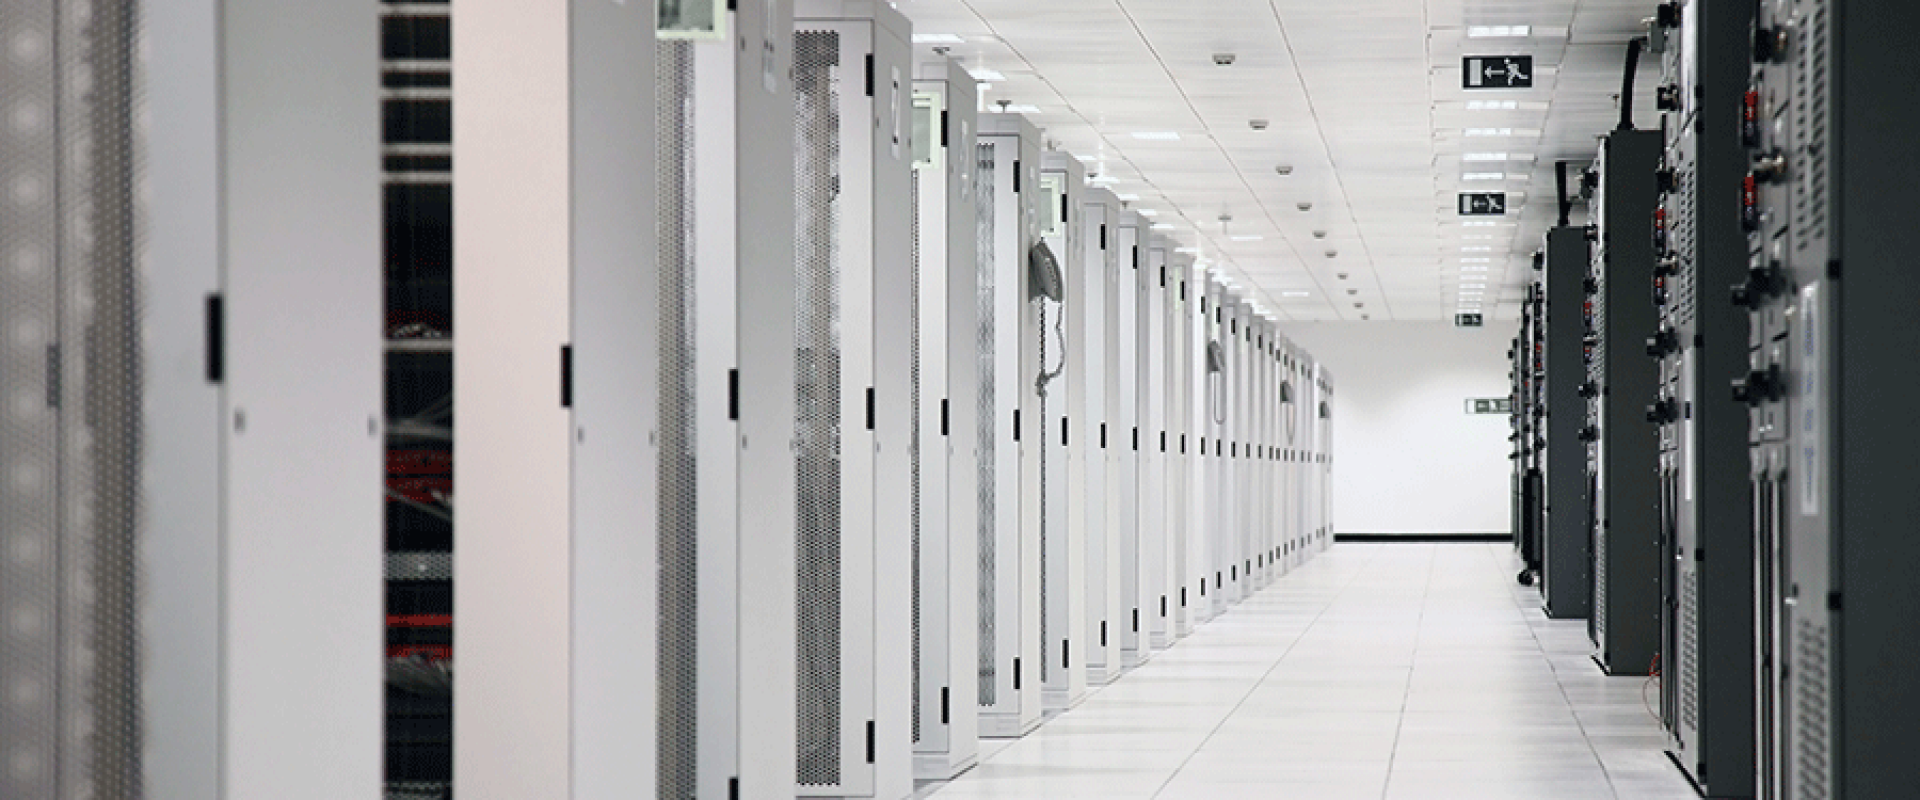 Why choose a Carrier Neutral data center?